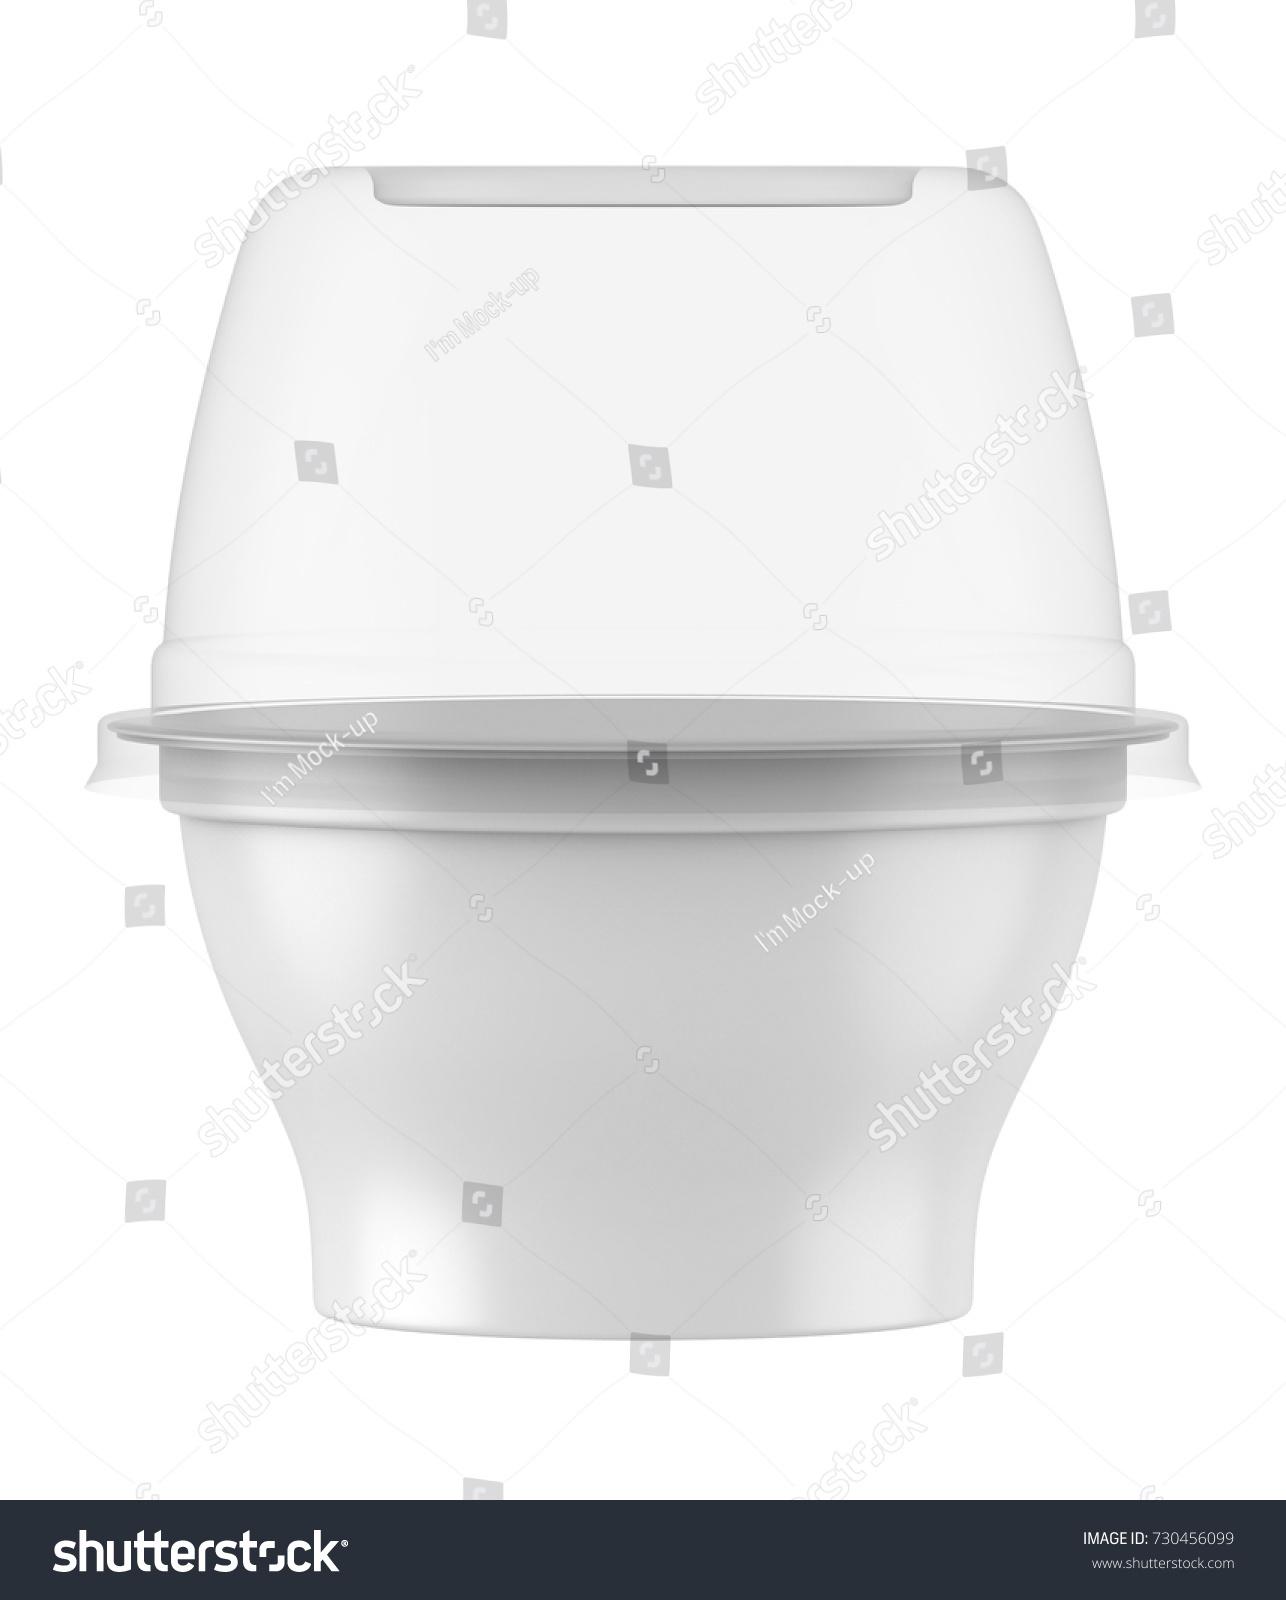 3 D Rendering Plastic Tub Clear Lid Stock Illustration 730456099 ...